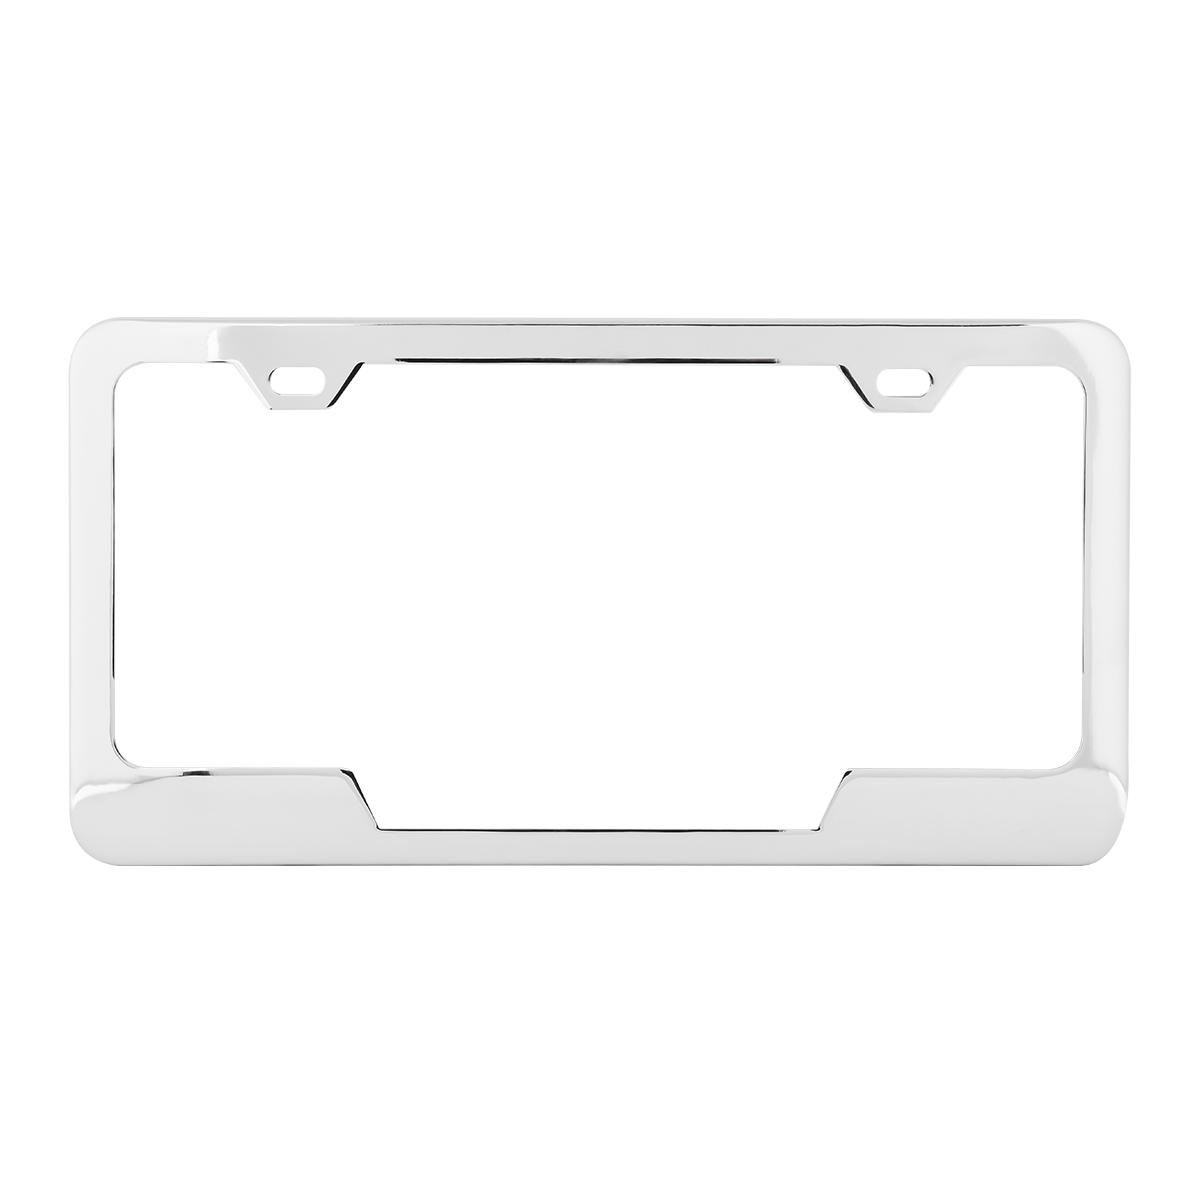 60404 Plain 2-Hole License Plate Frames with Center Cut